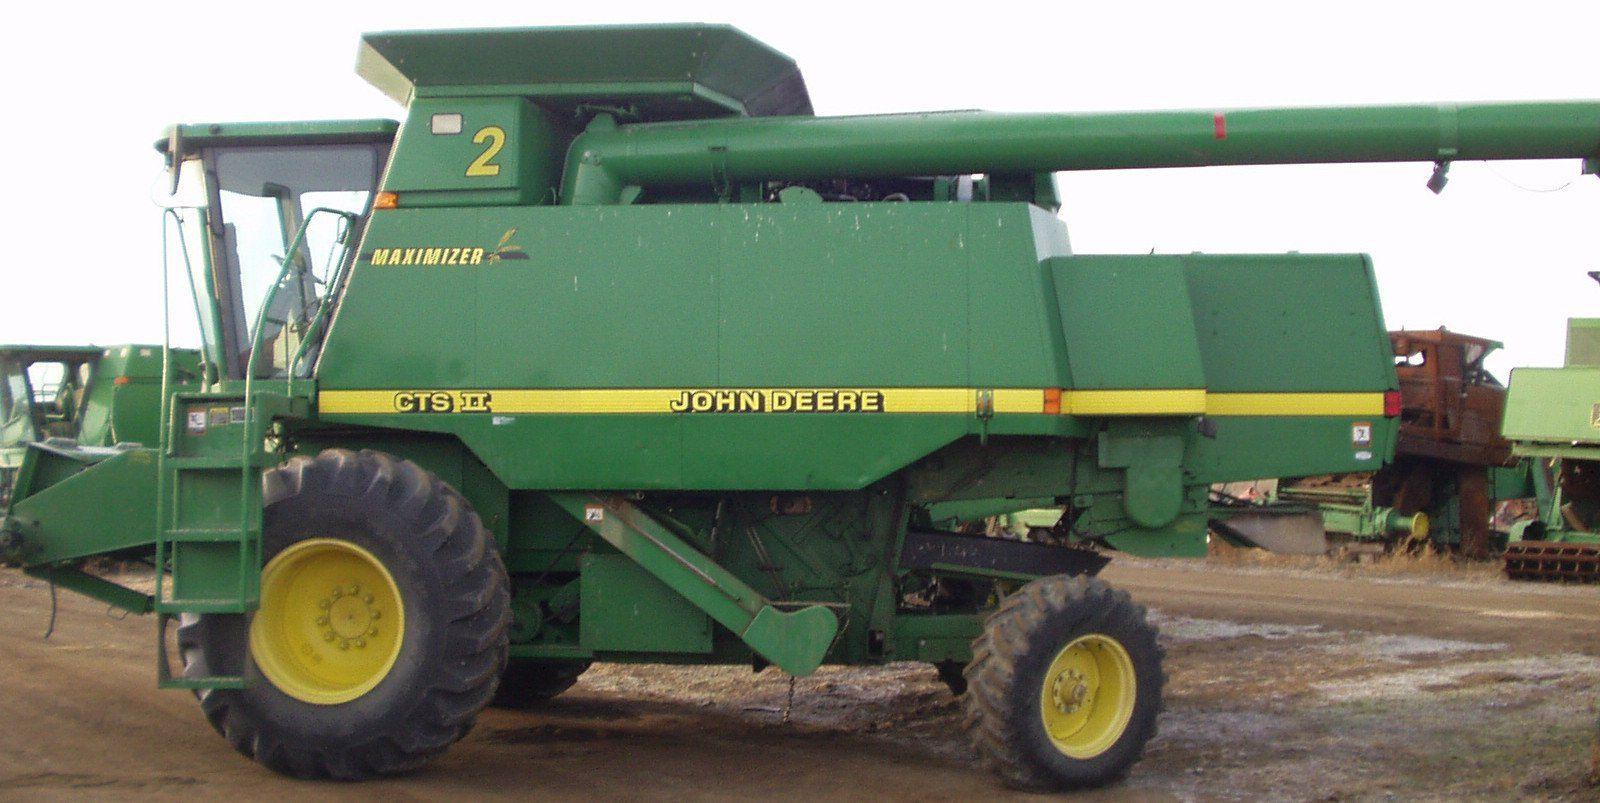 JOHN DEERE CTS II COMBINE PARTS CATALOG MANUAL PC2752 Parts Catalog, John  Deere Tractors,